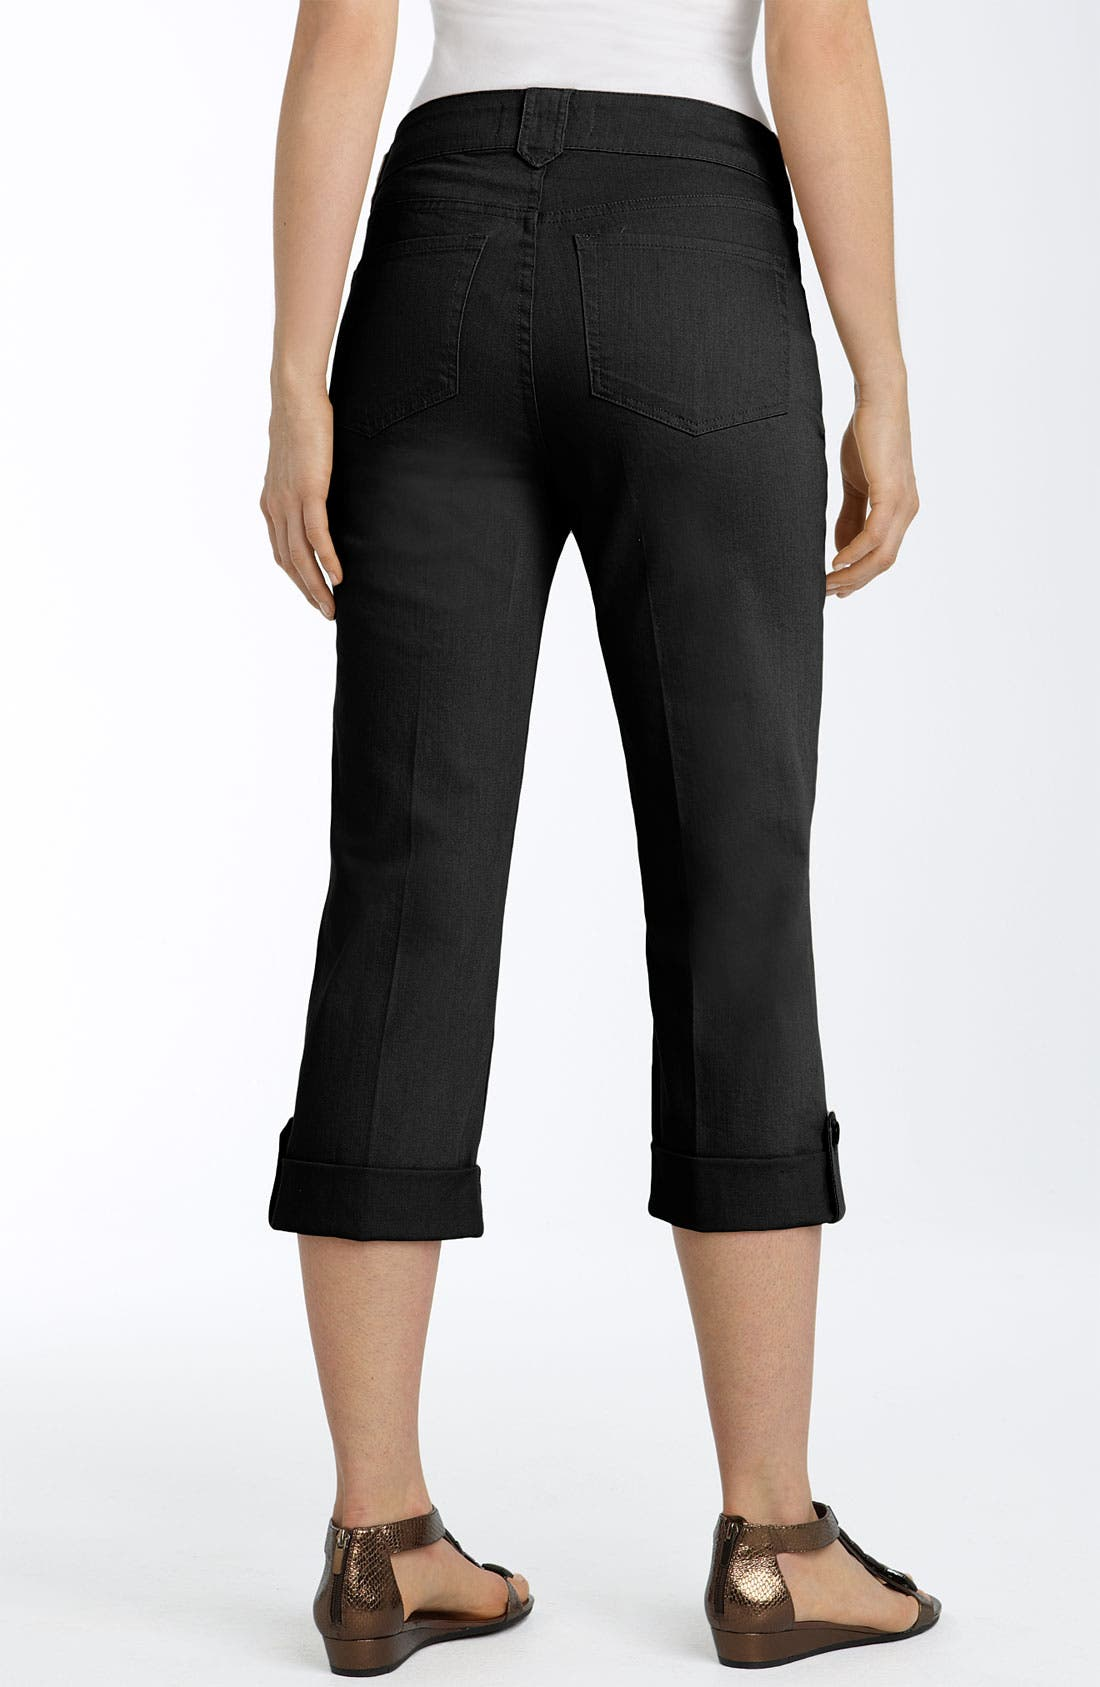 'Katia' Capri Jeans,                             Main thumbnail 1, color,                             001